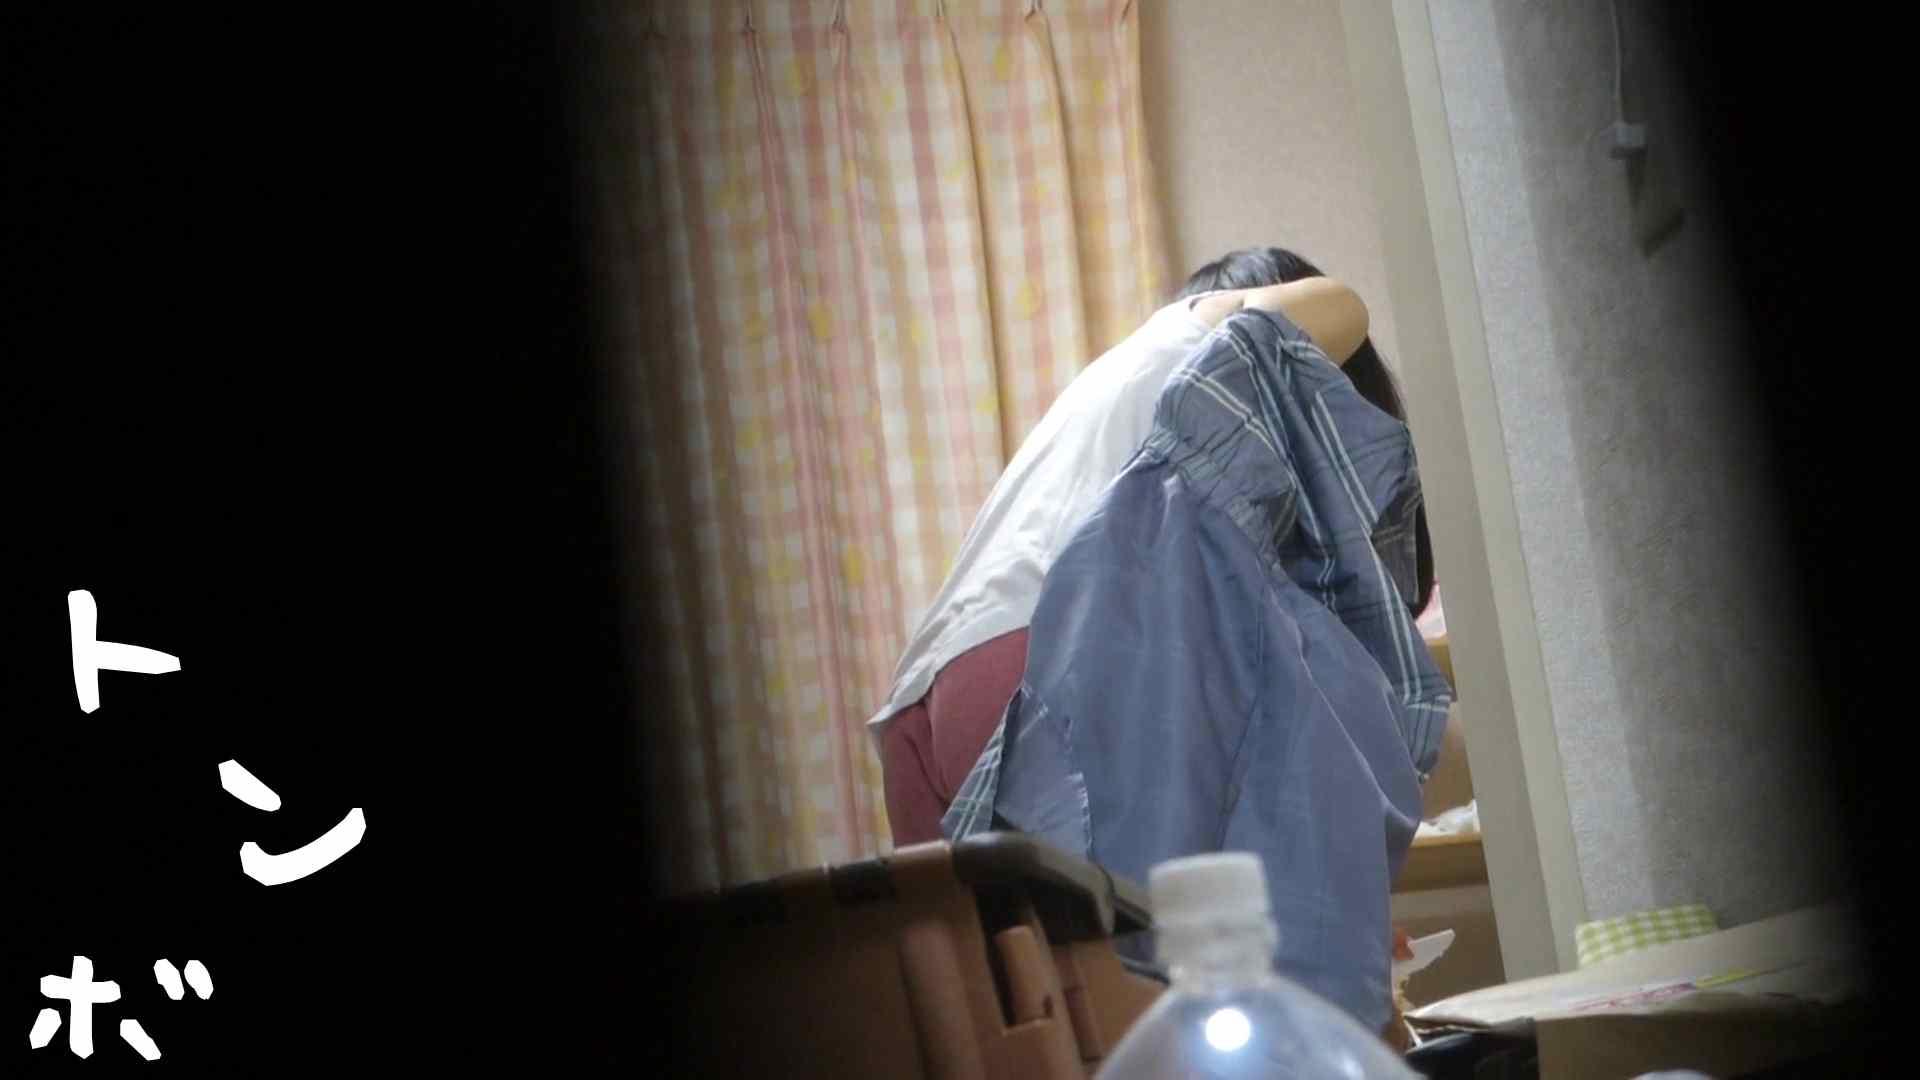 リアル盗撮 現役女子大生の私生活③ 細身  104PIX 4